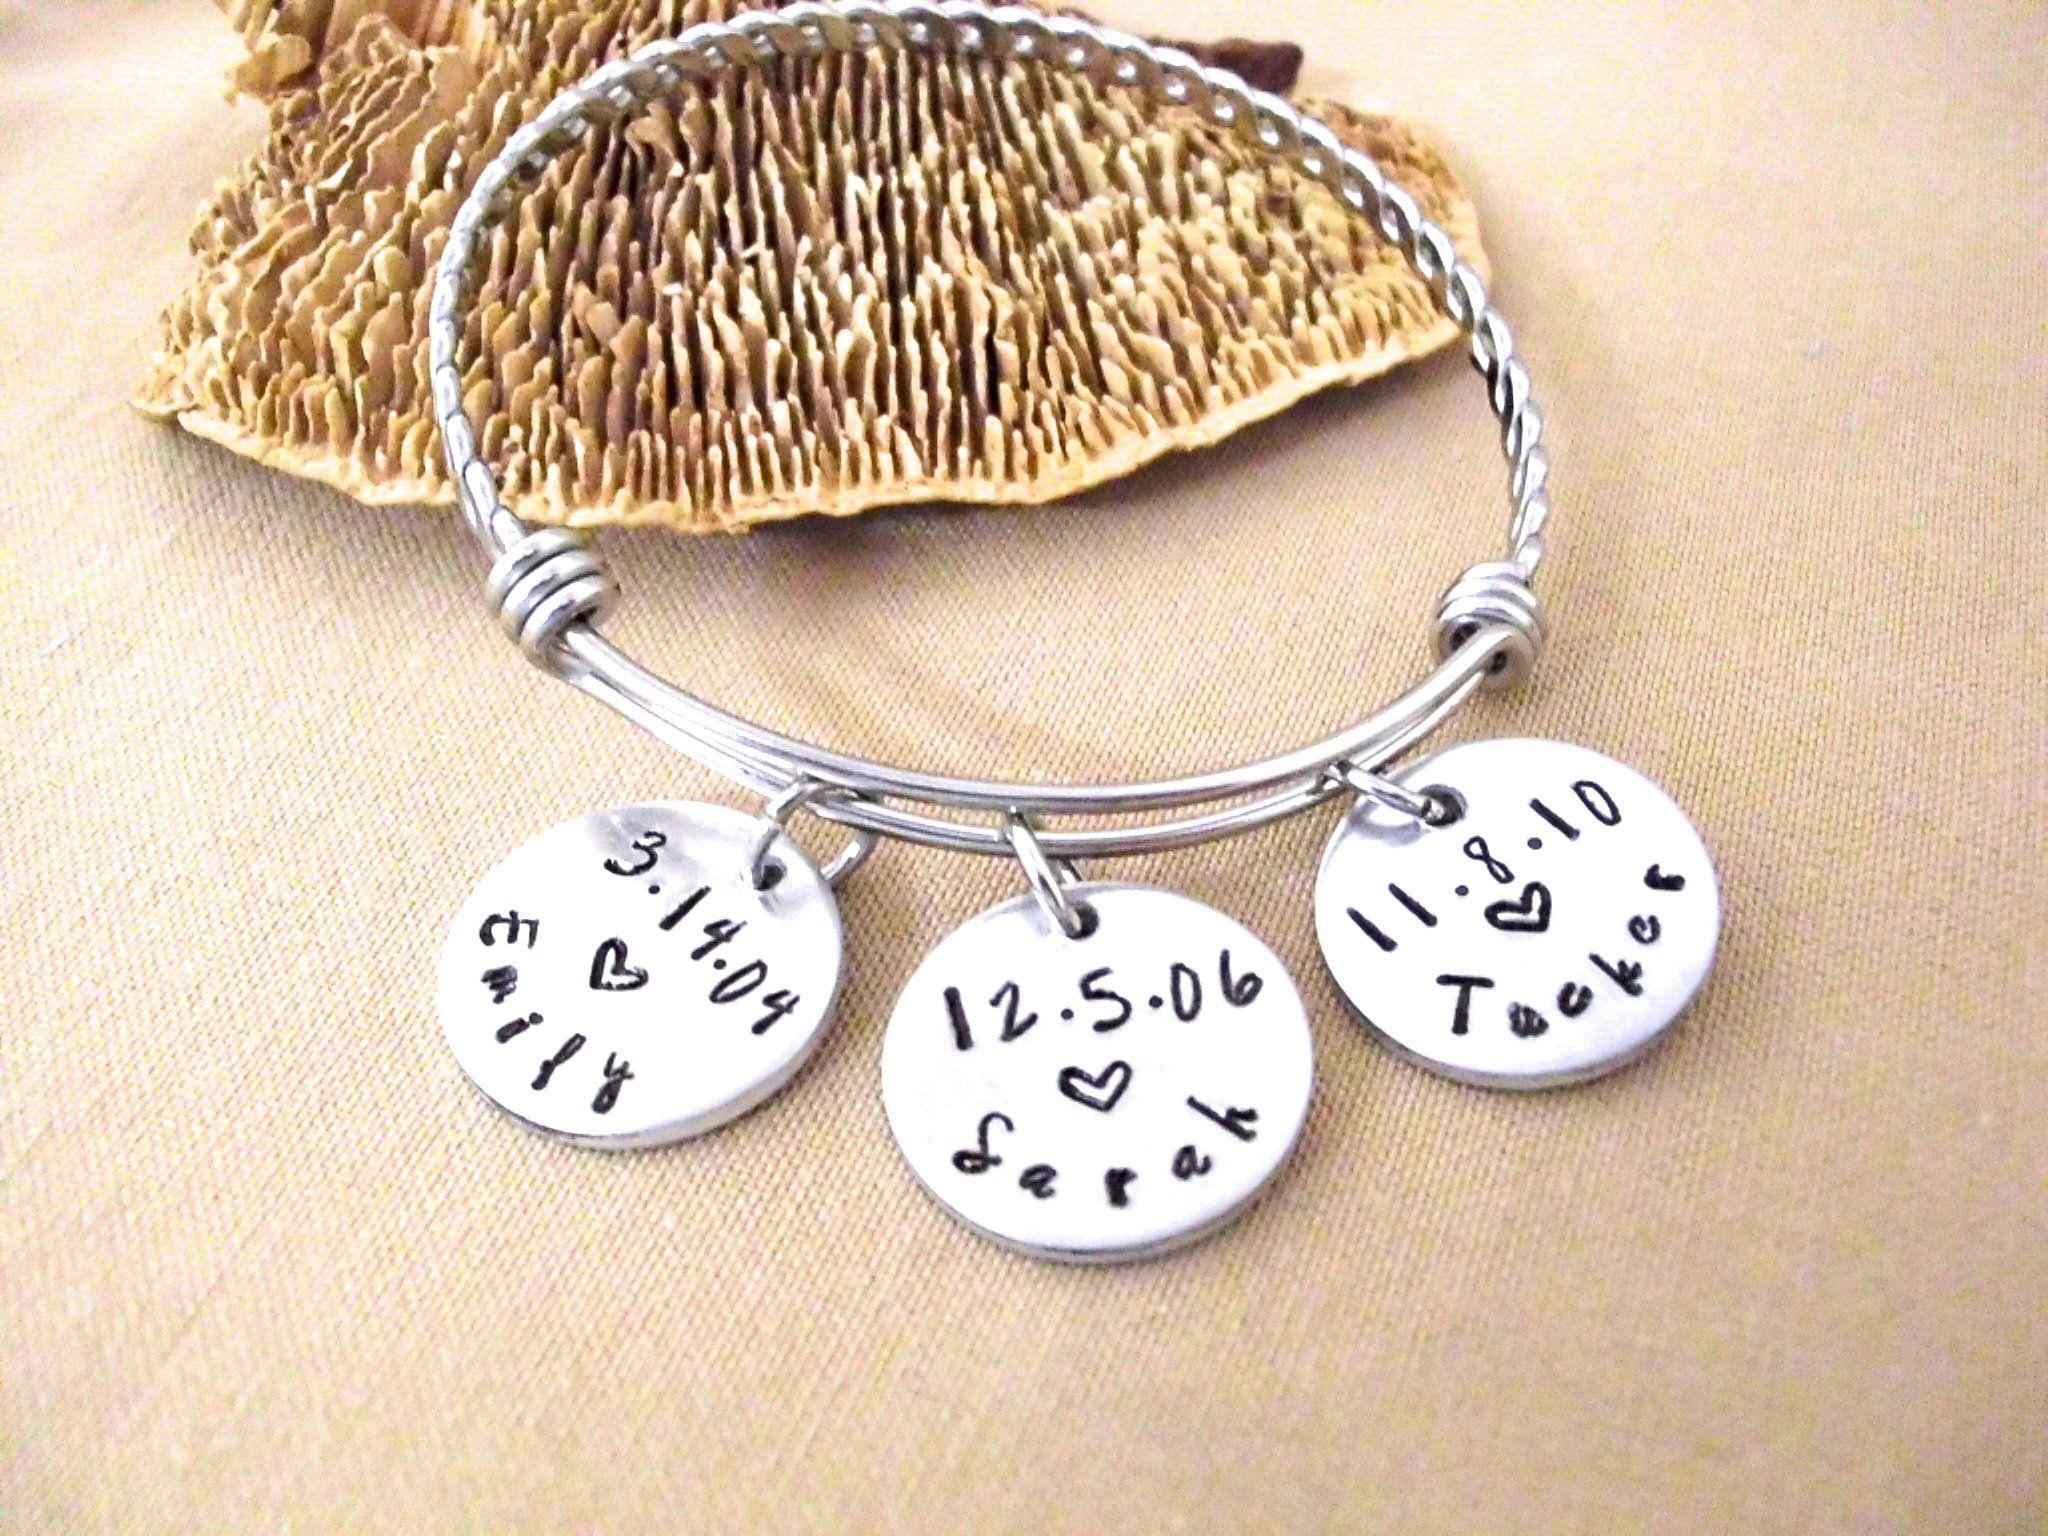 Nana Gifts Custom Nana Jewelry Personalized Grandma Bracelet New Grandma Gifts Gift for Nana Childs Name Bracelet Nana Bracelet